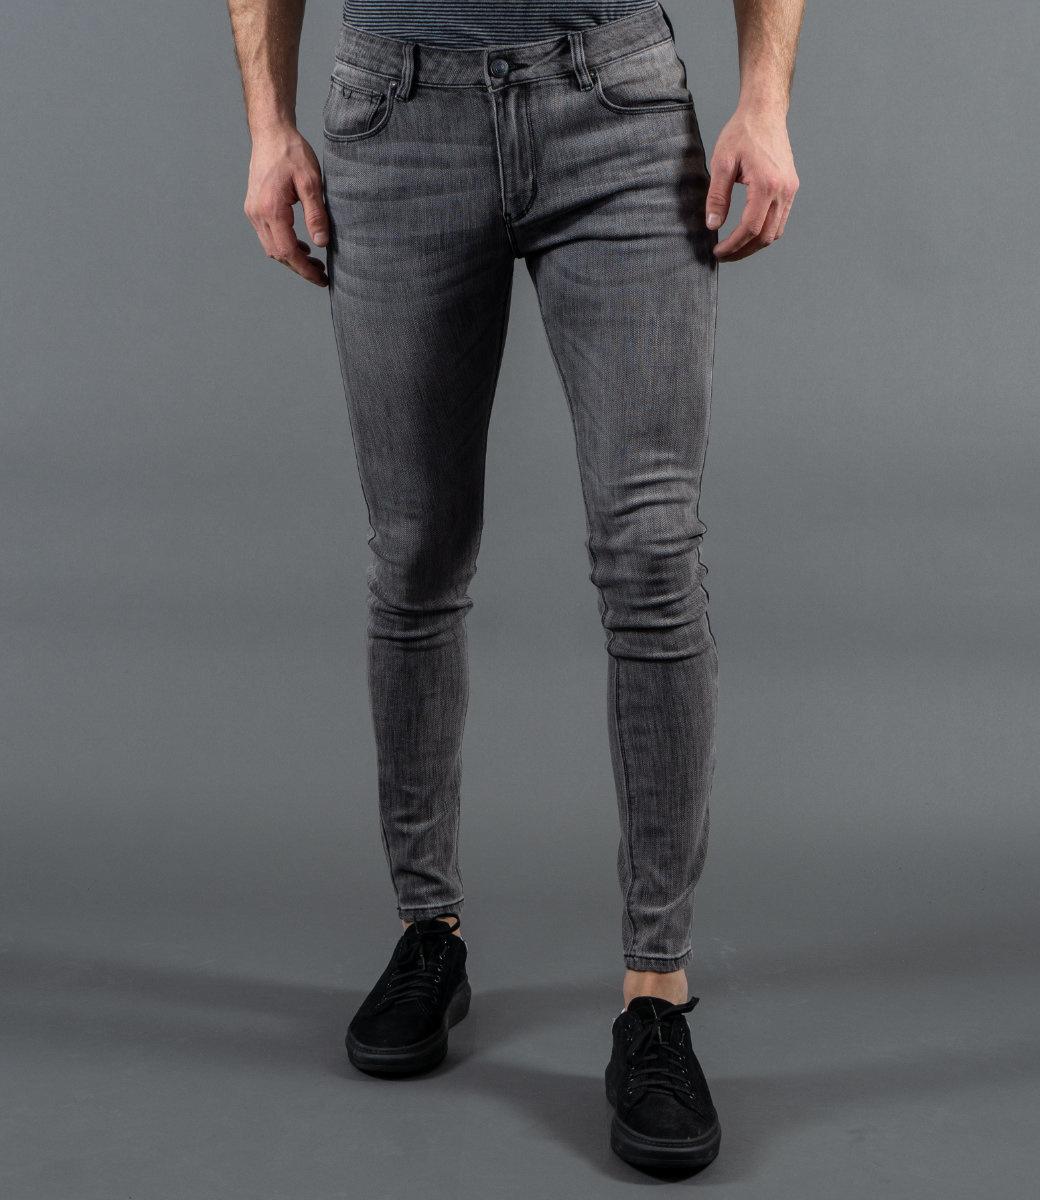 Zumo Jeans STEVE-WORN GreyBlack